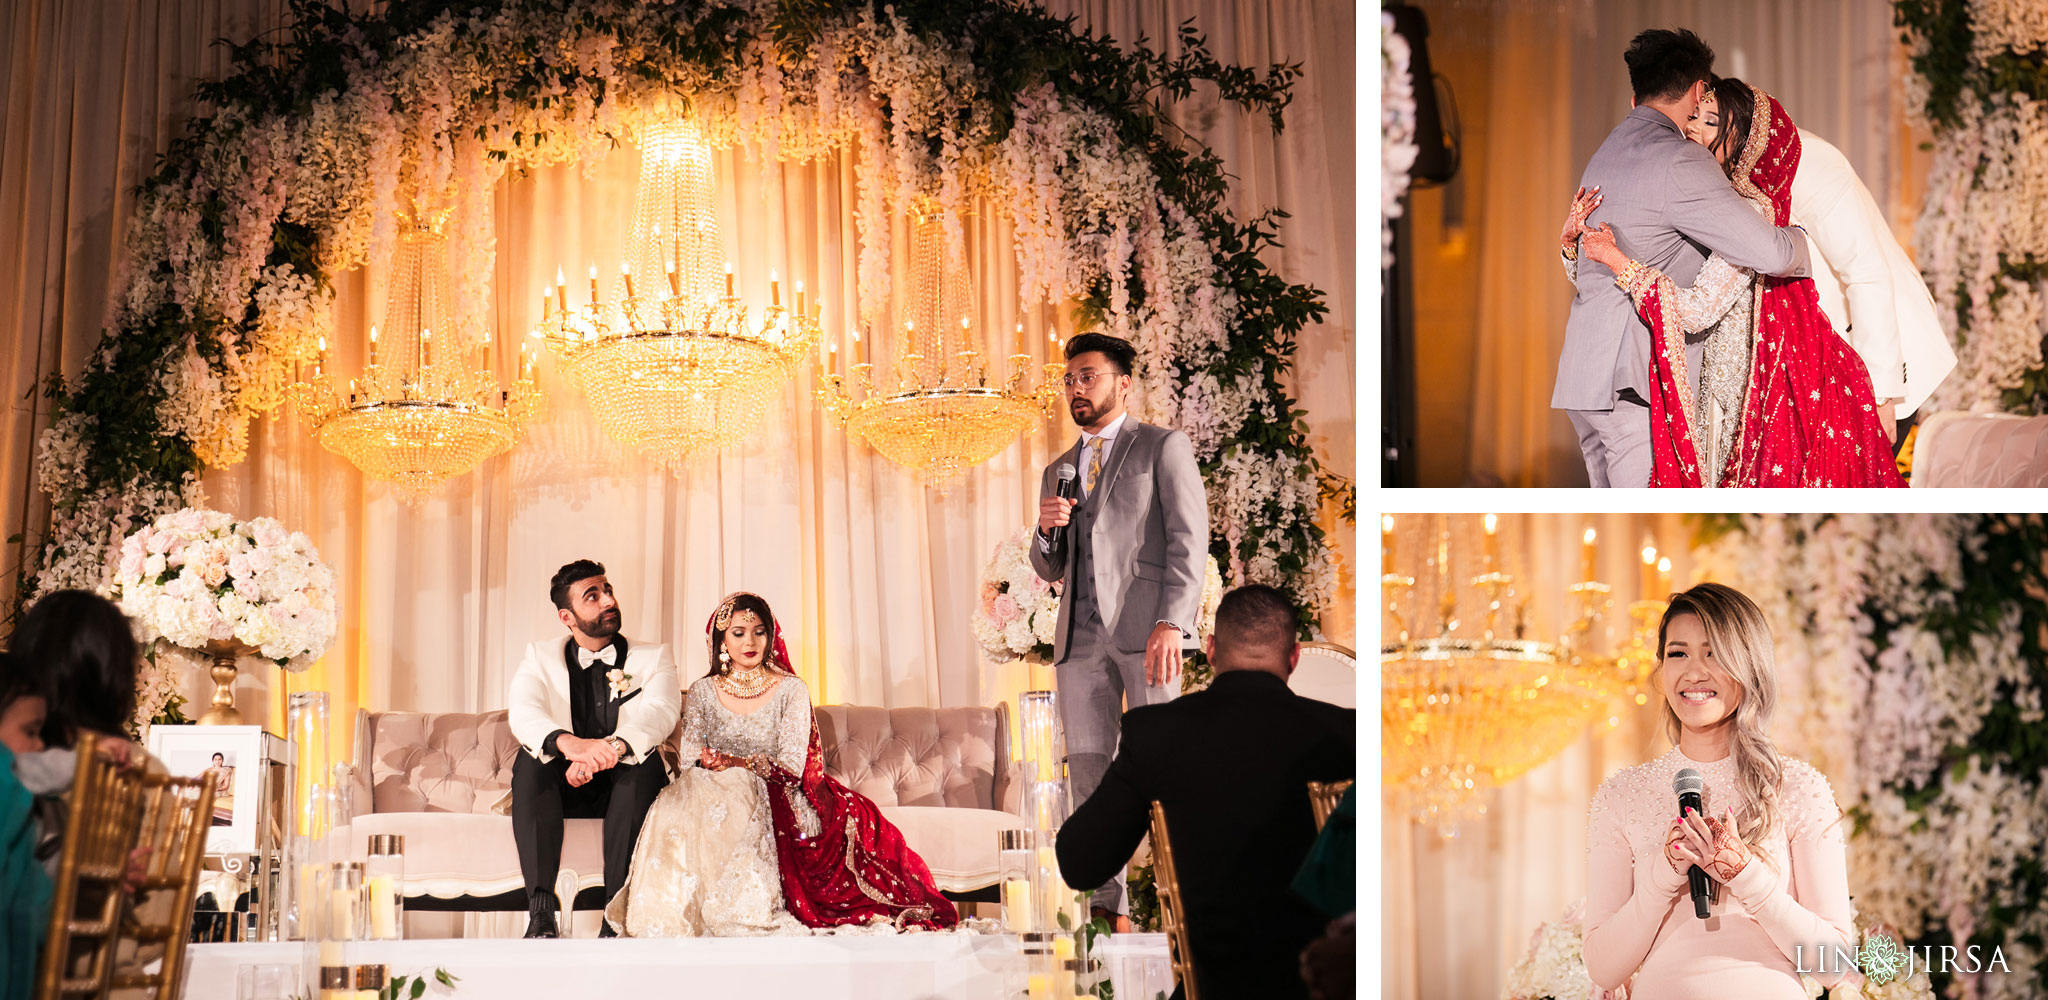 21 Majestic Downtown Los Angeles Pakistani Muslim Wedding Photography